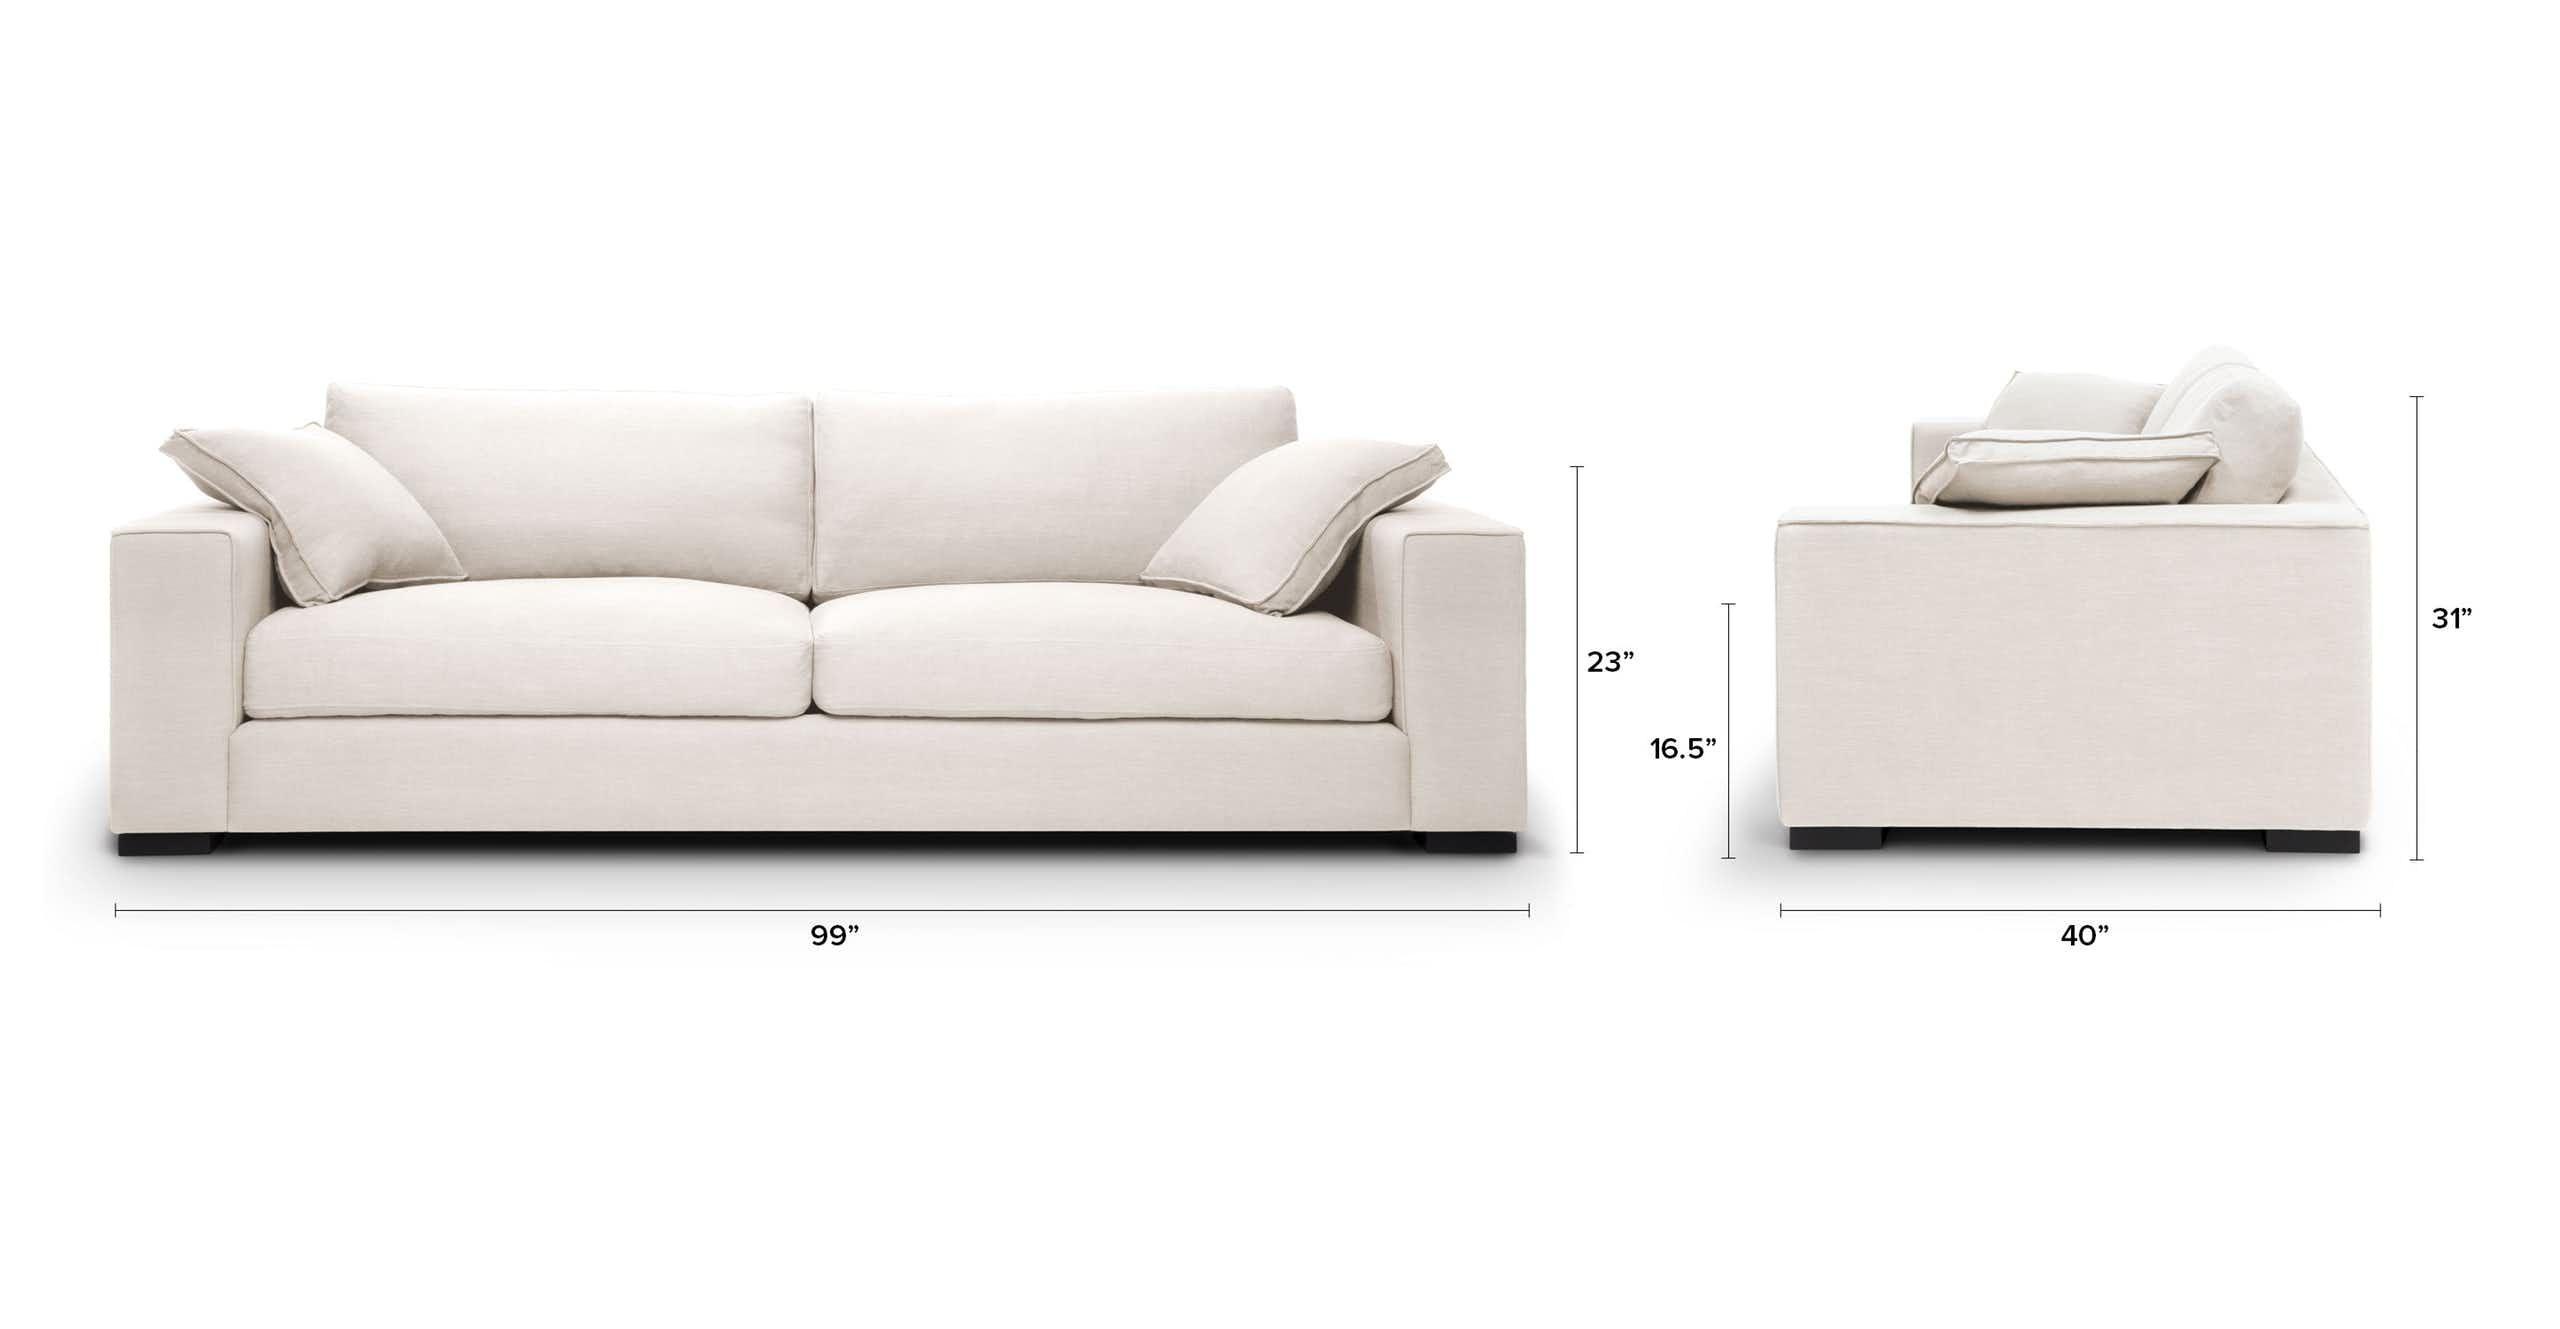 Sitka Quartz White Sofa White Sofas Sofa Mid Century Modern Sofa